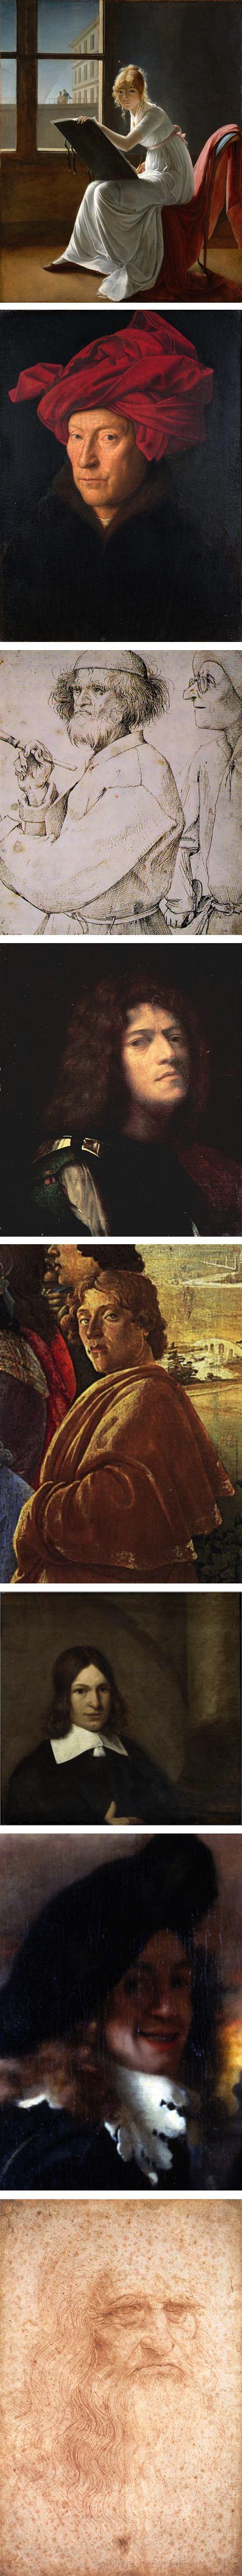 Marie-Denise Villers, Jan van Eyck, Pieter Bruegel the Elder, Giorgione, Sandro Botticelli, Peter de Hooch, Johannes Vermeer, Leonardo da Vinci